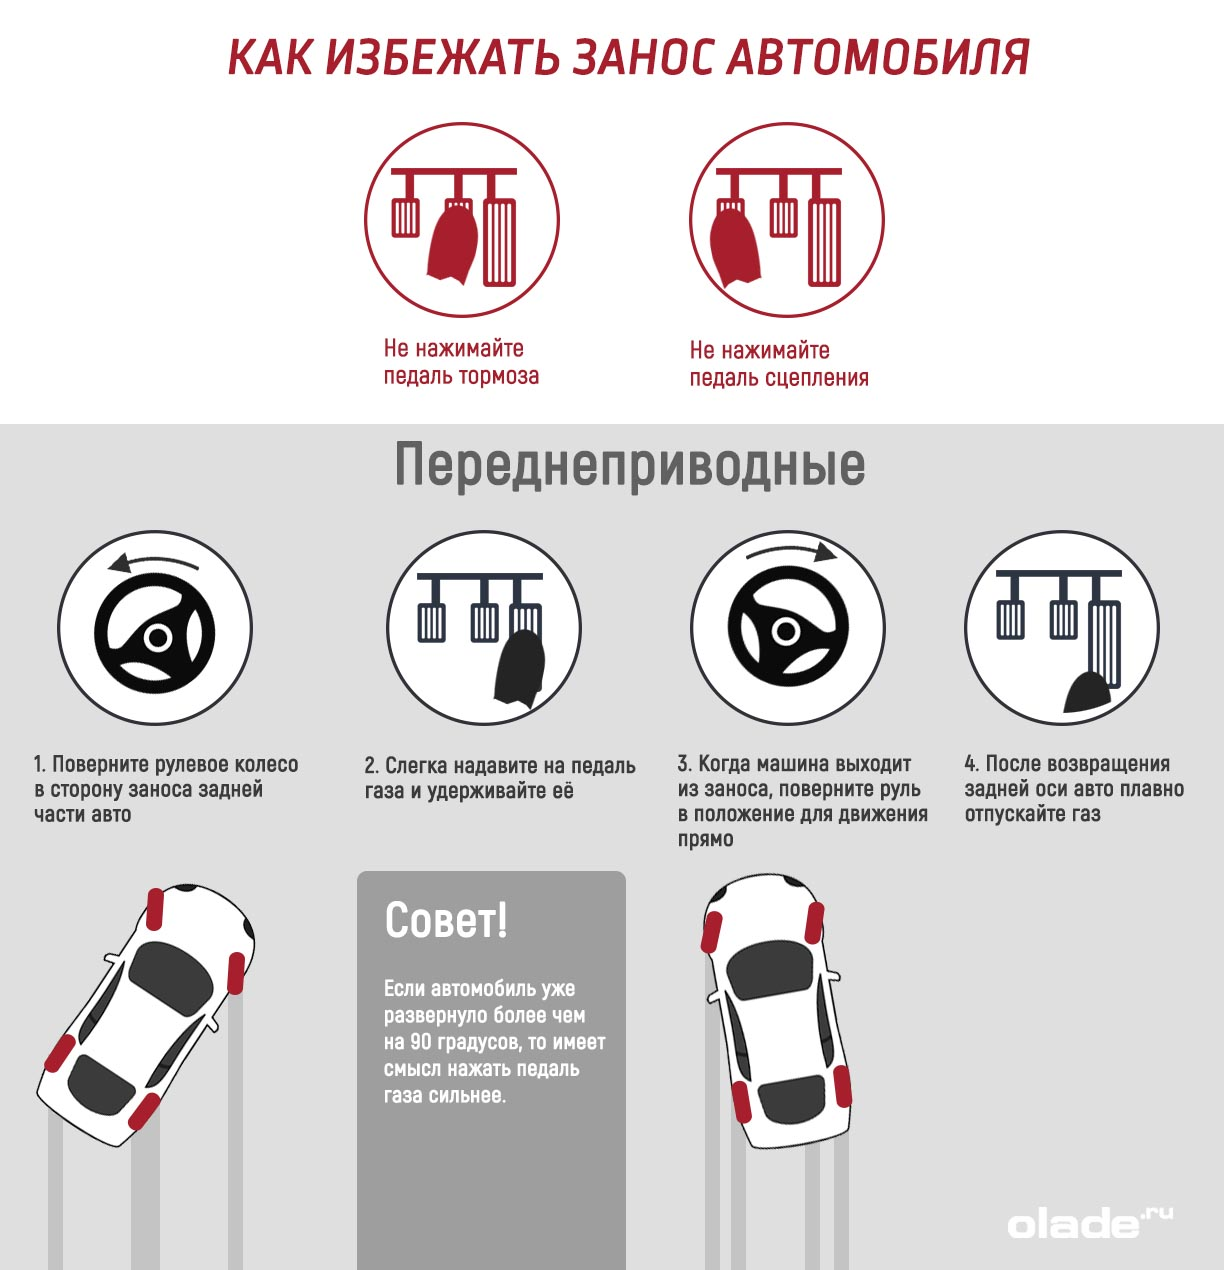 Занос переднеприводного автомобиля